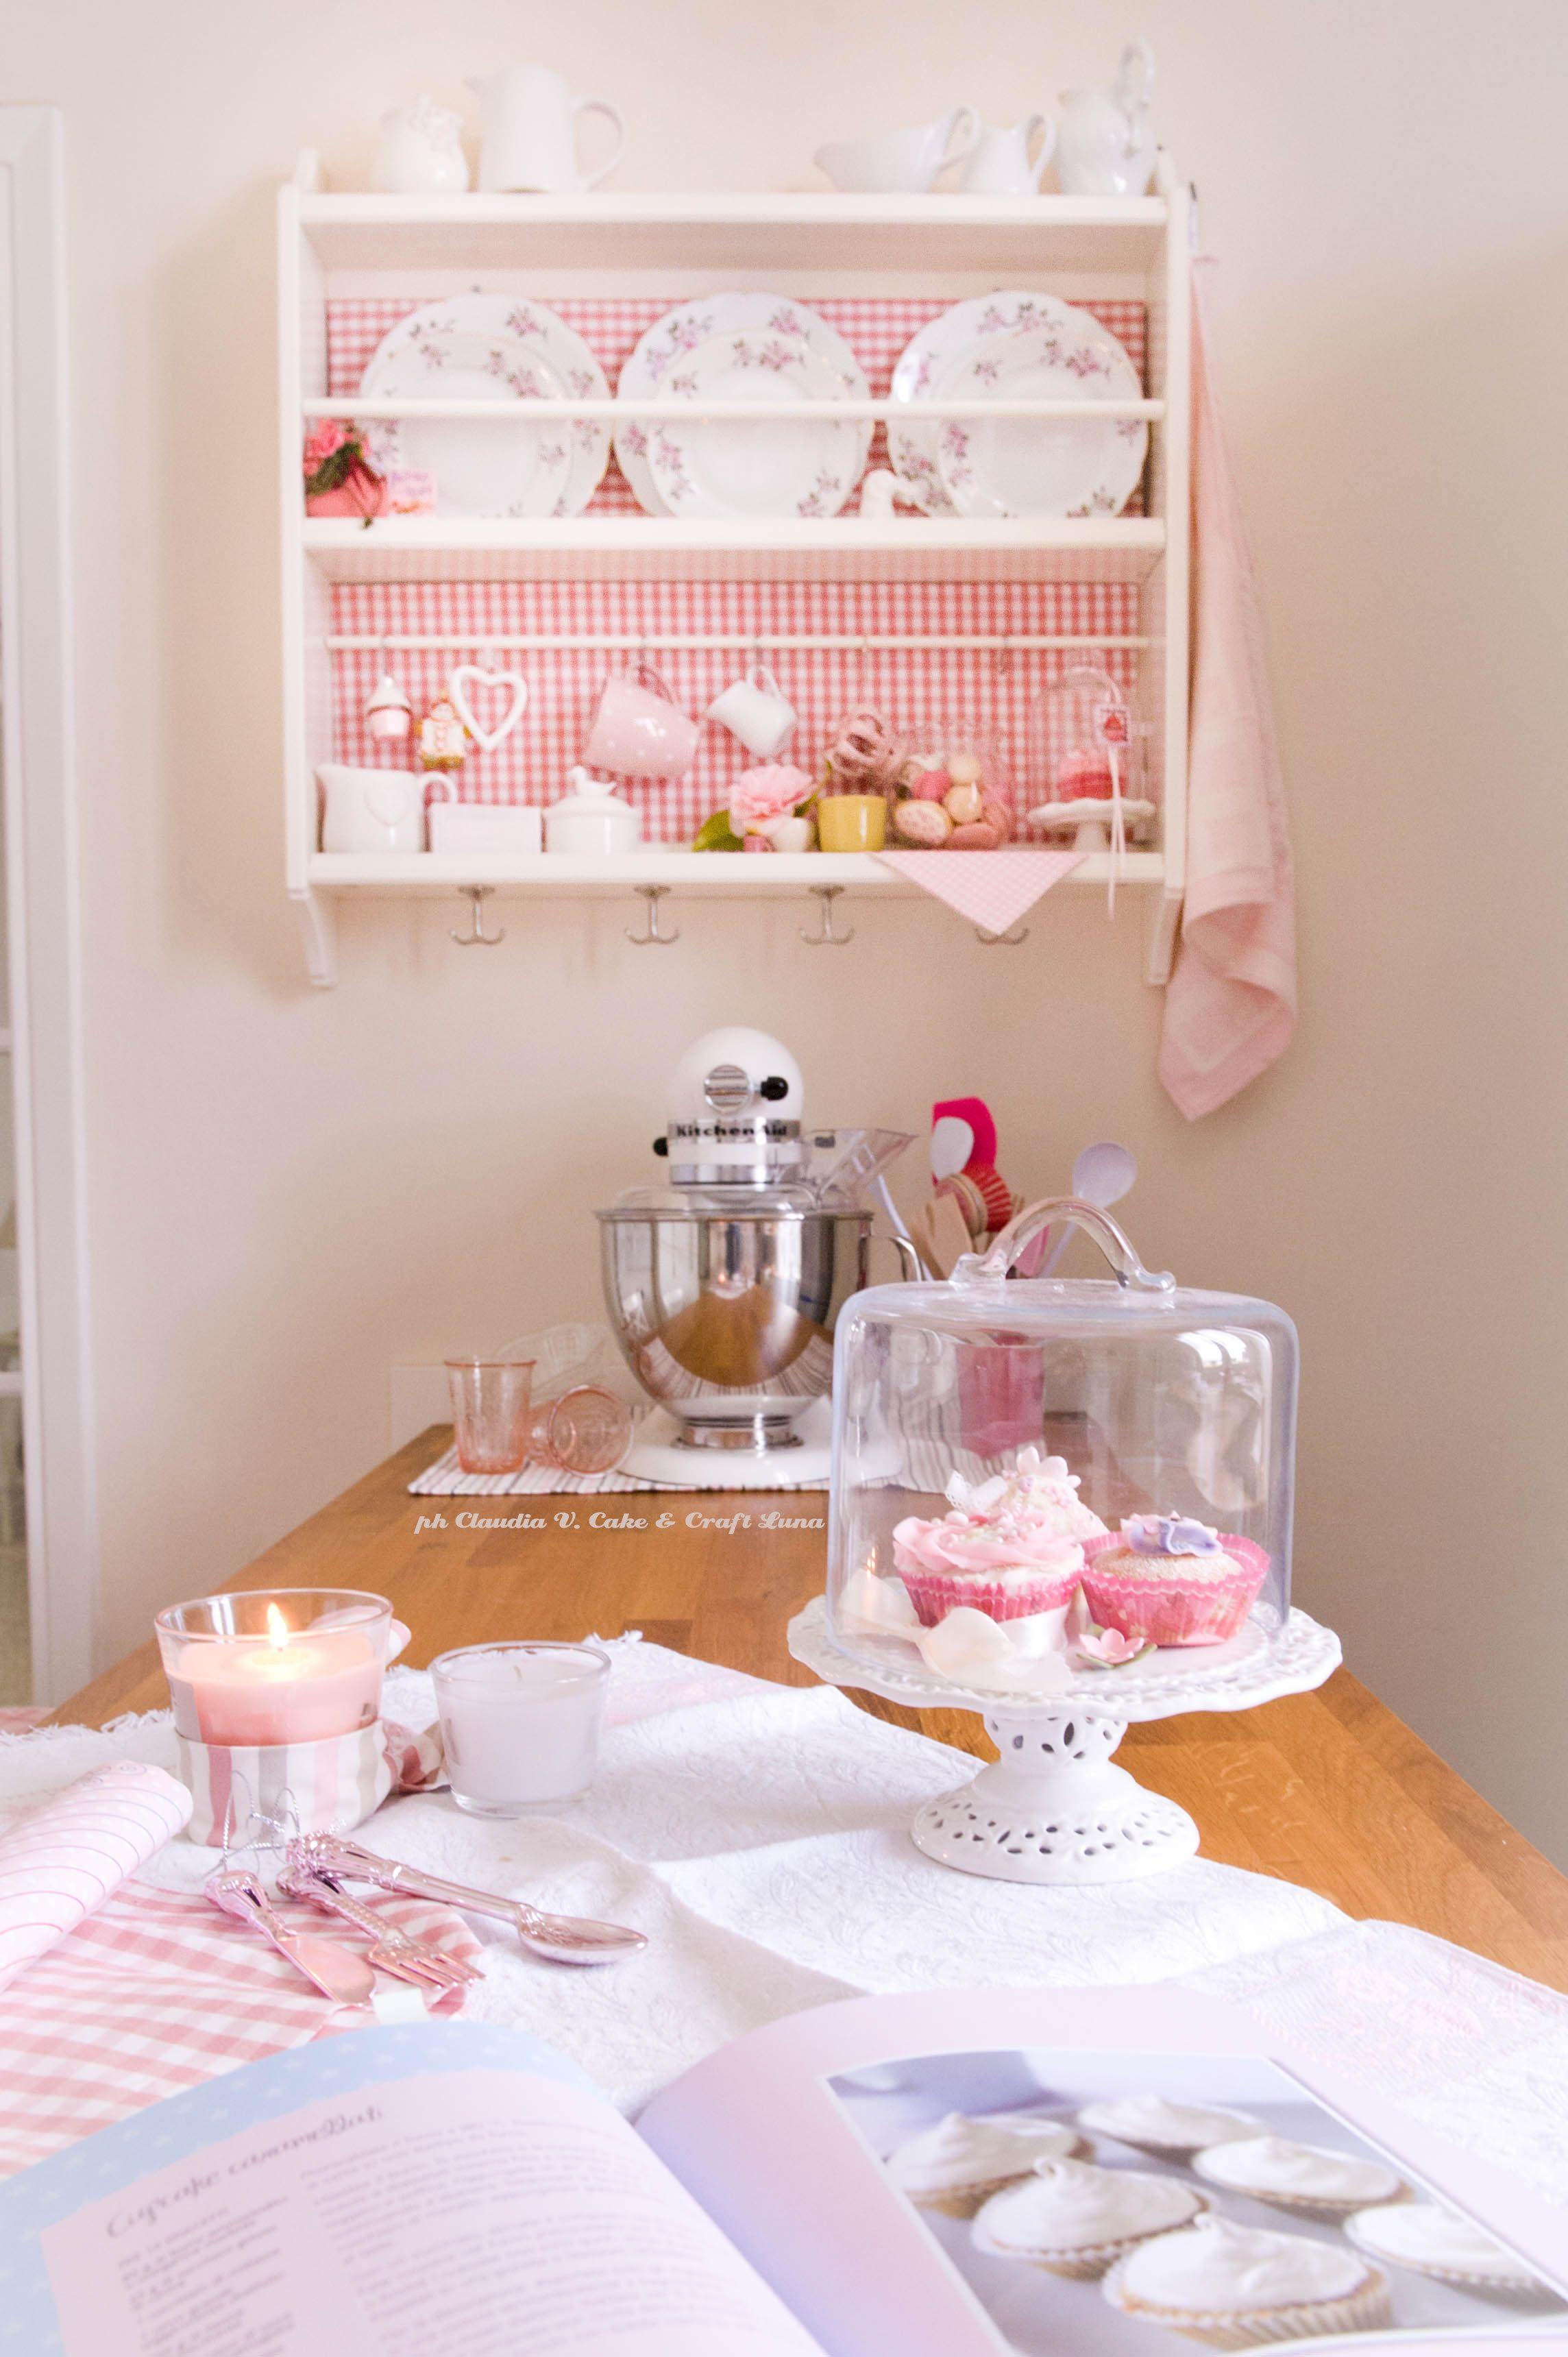 cucina piattaia stenstorp ikea con tessuto rosa | house in and out ...